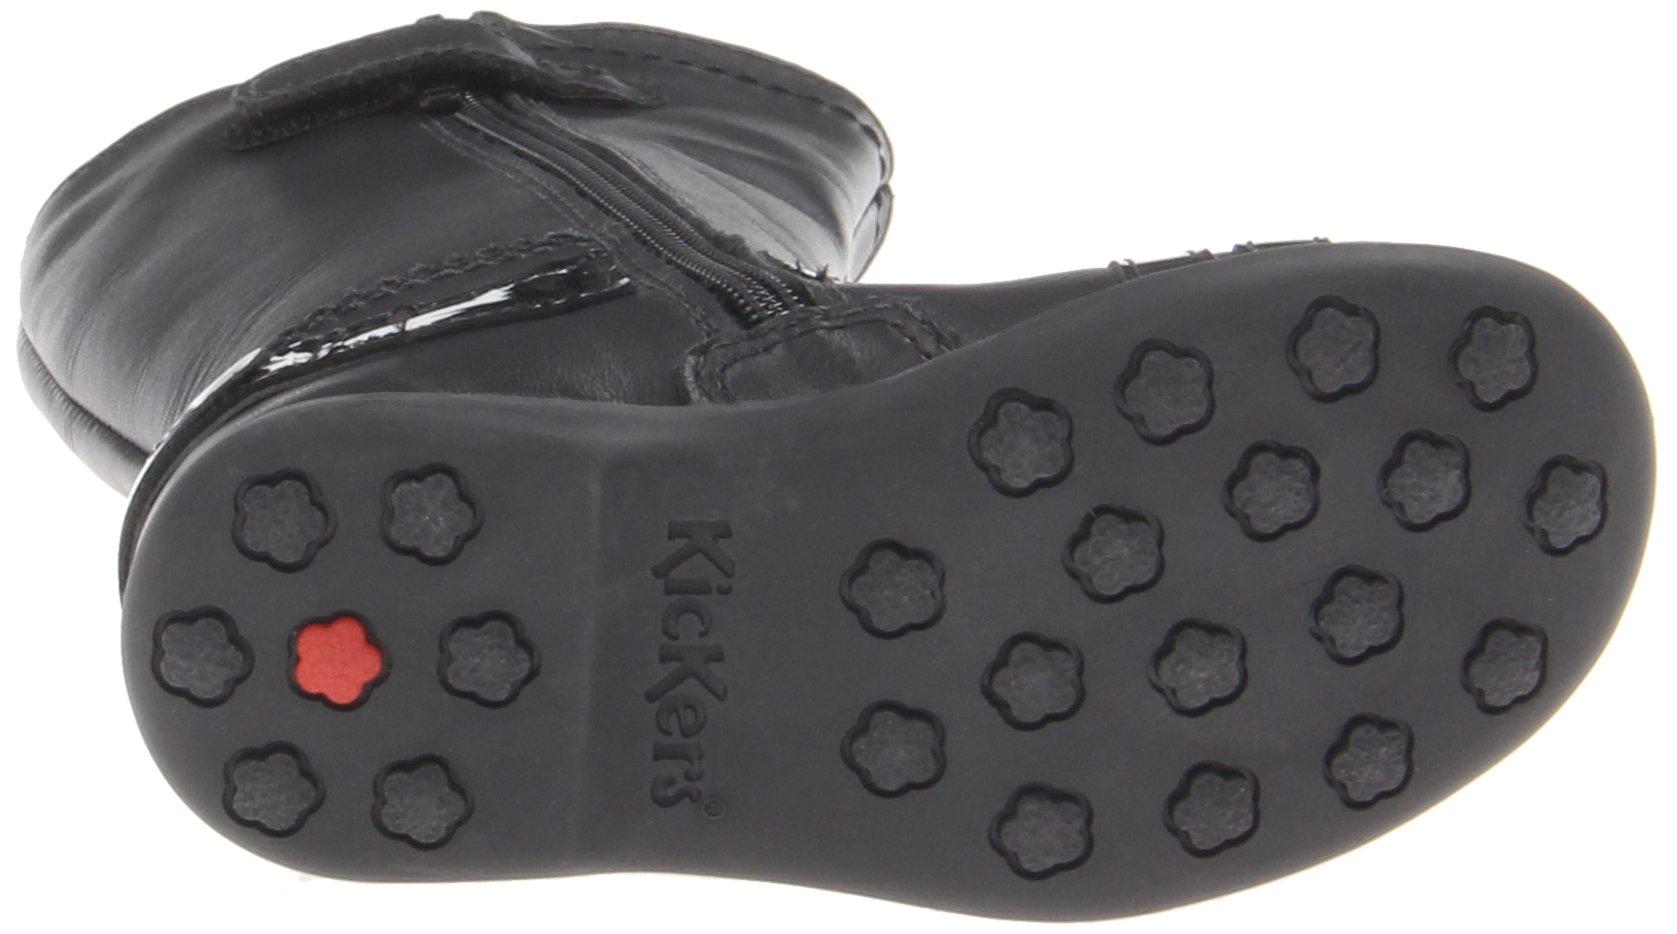 Kickers Kid's Angelyn Boot, Black, 28 (US 10.5 Little Kid) M US by Kickers (Image #6)